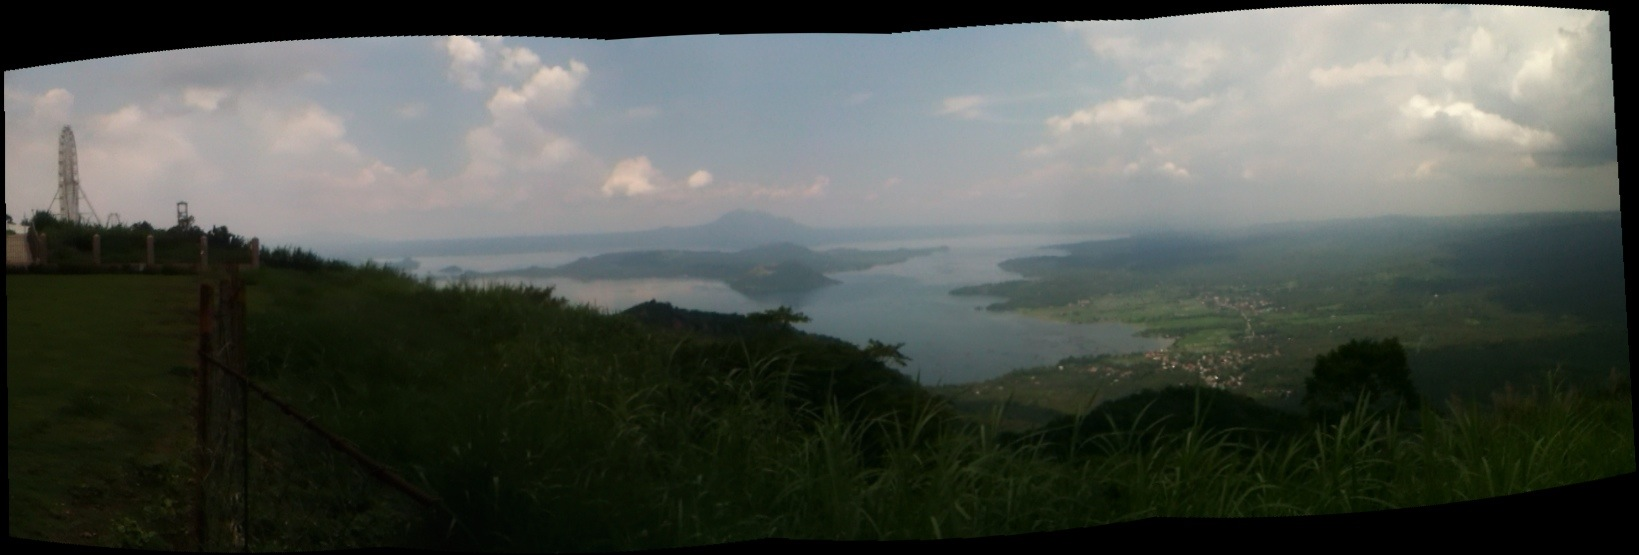 Taal Volcano and Lake panoramic view, ferris wheel, Philippines